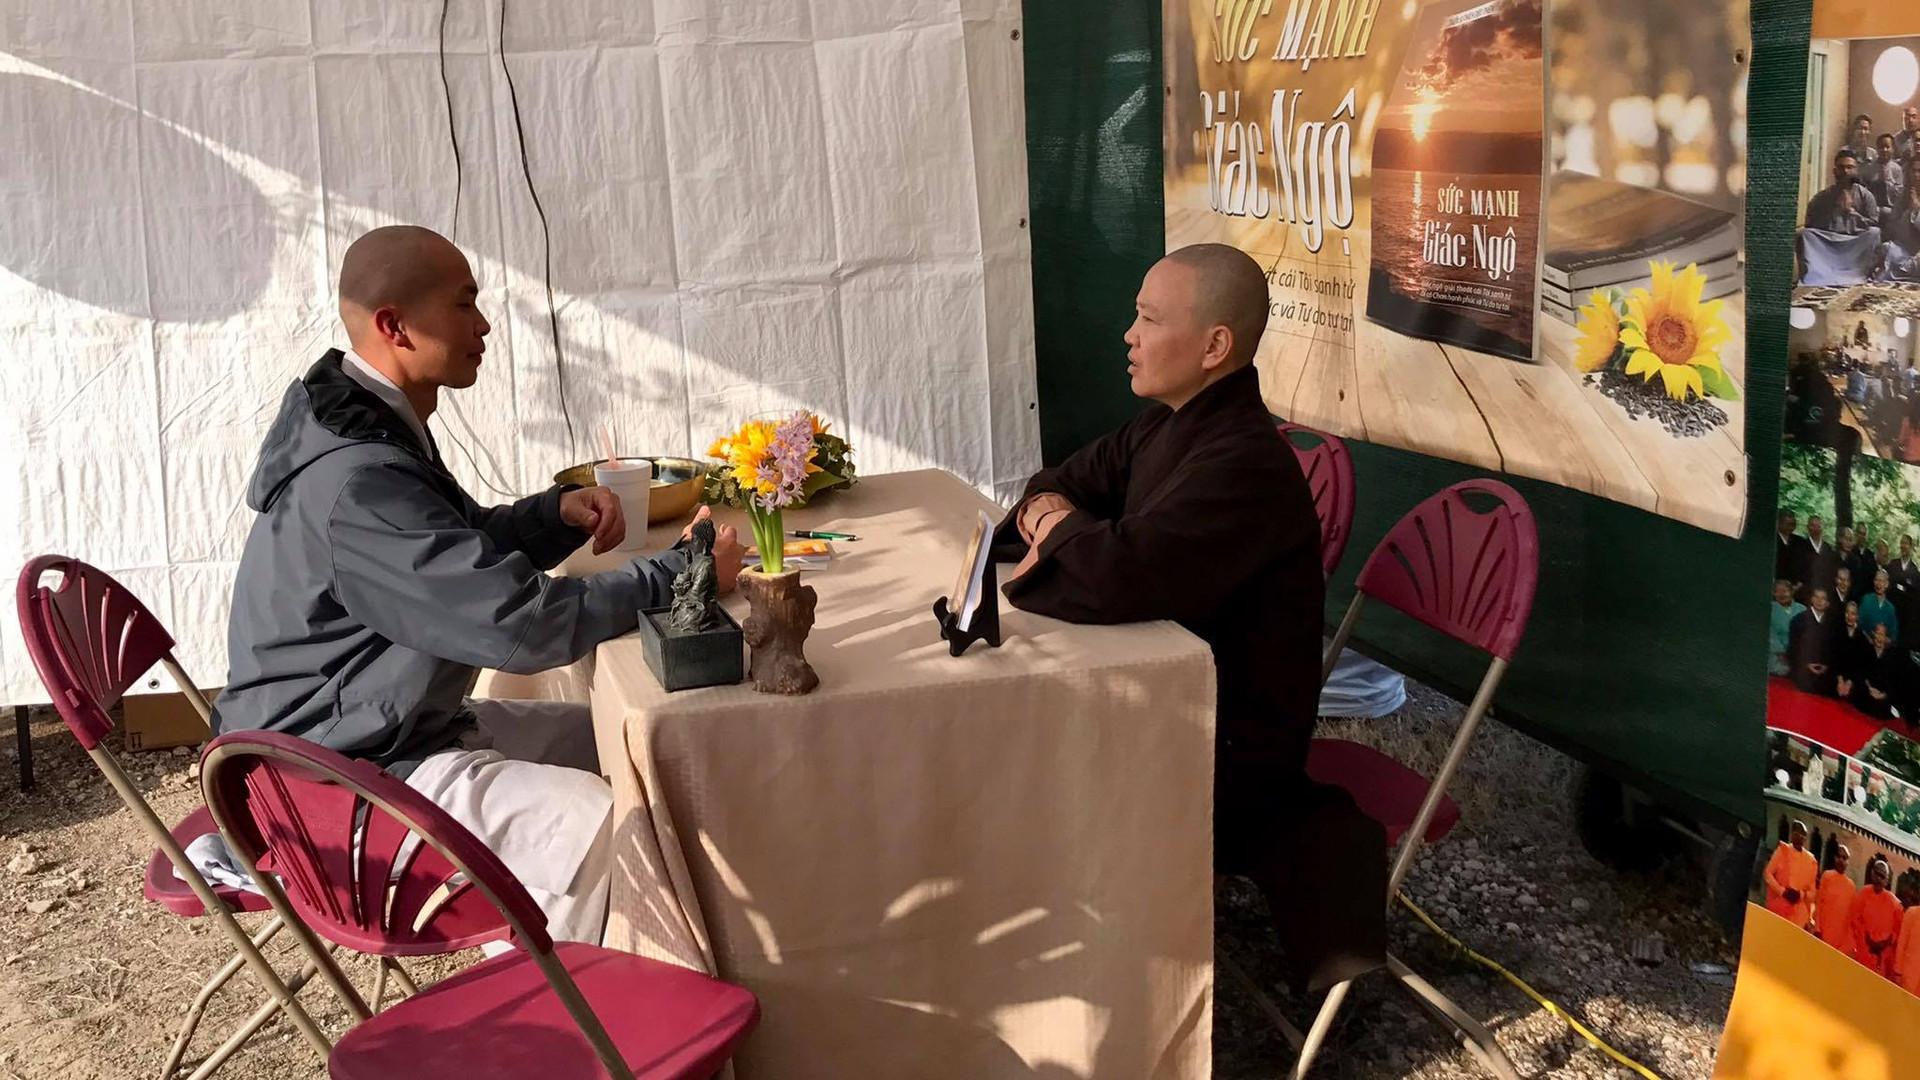 Hoi Xuan Giac Ngo 2018 19.jpg